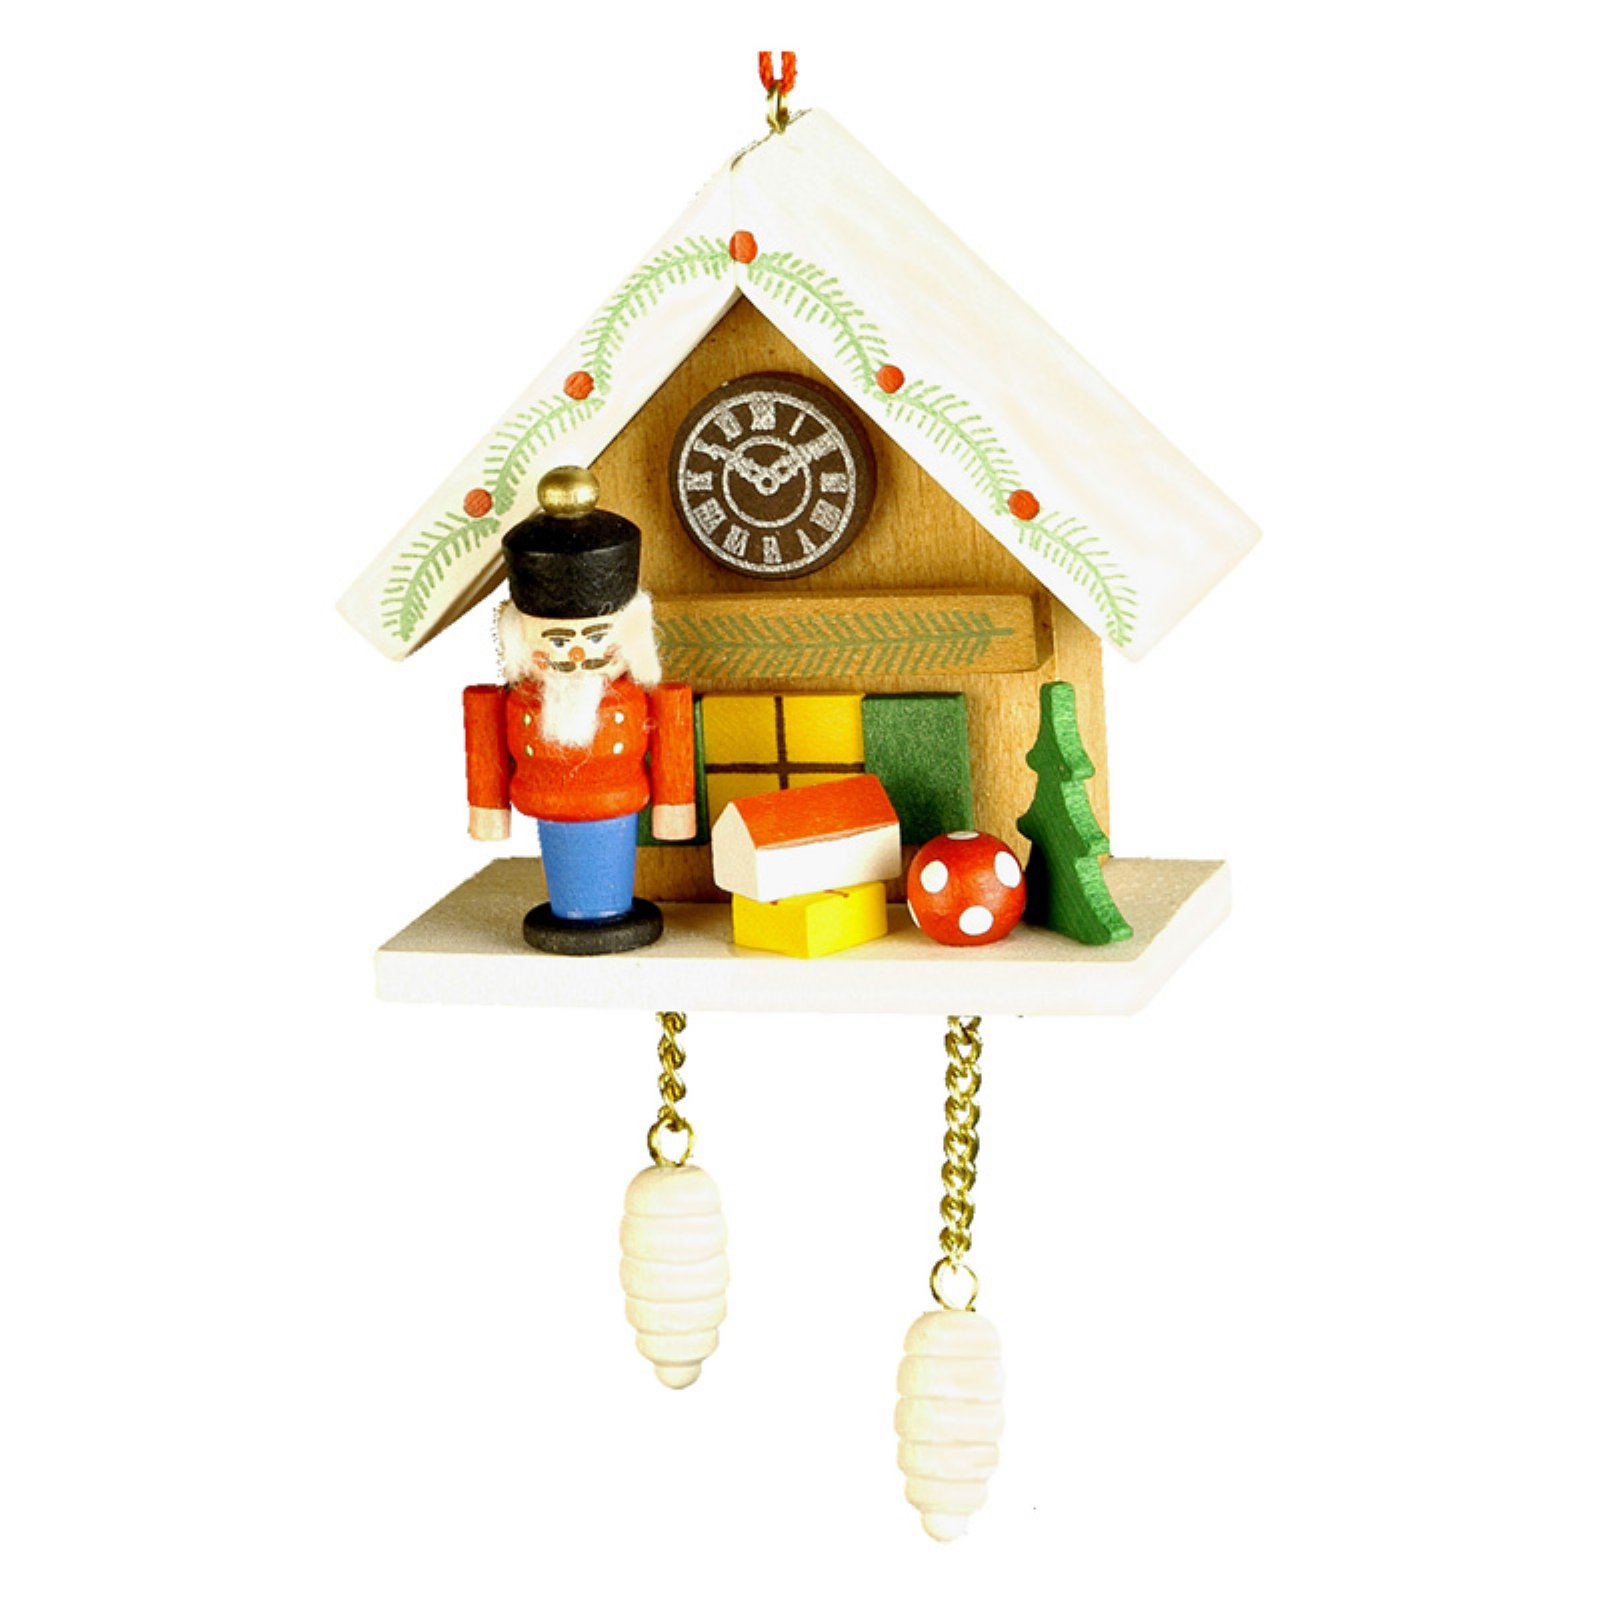 Christian Ulbricht Nutcracker with Brown Cuckoo Ornament